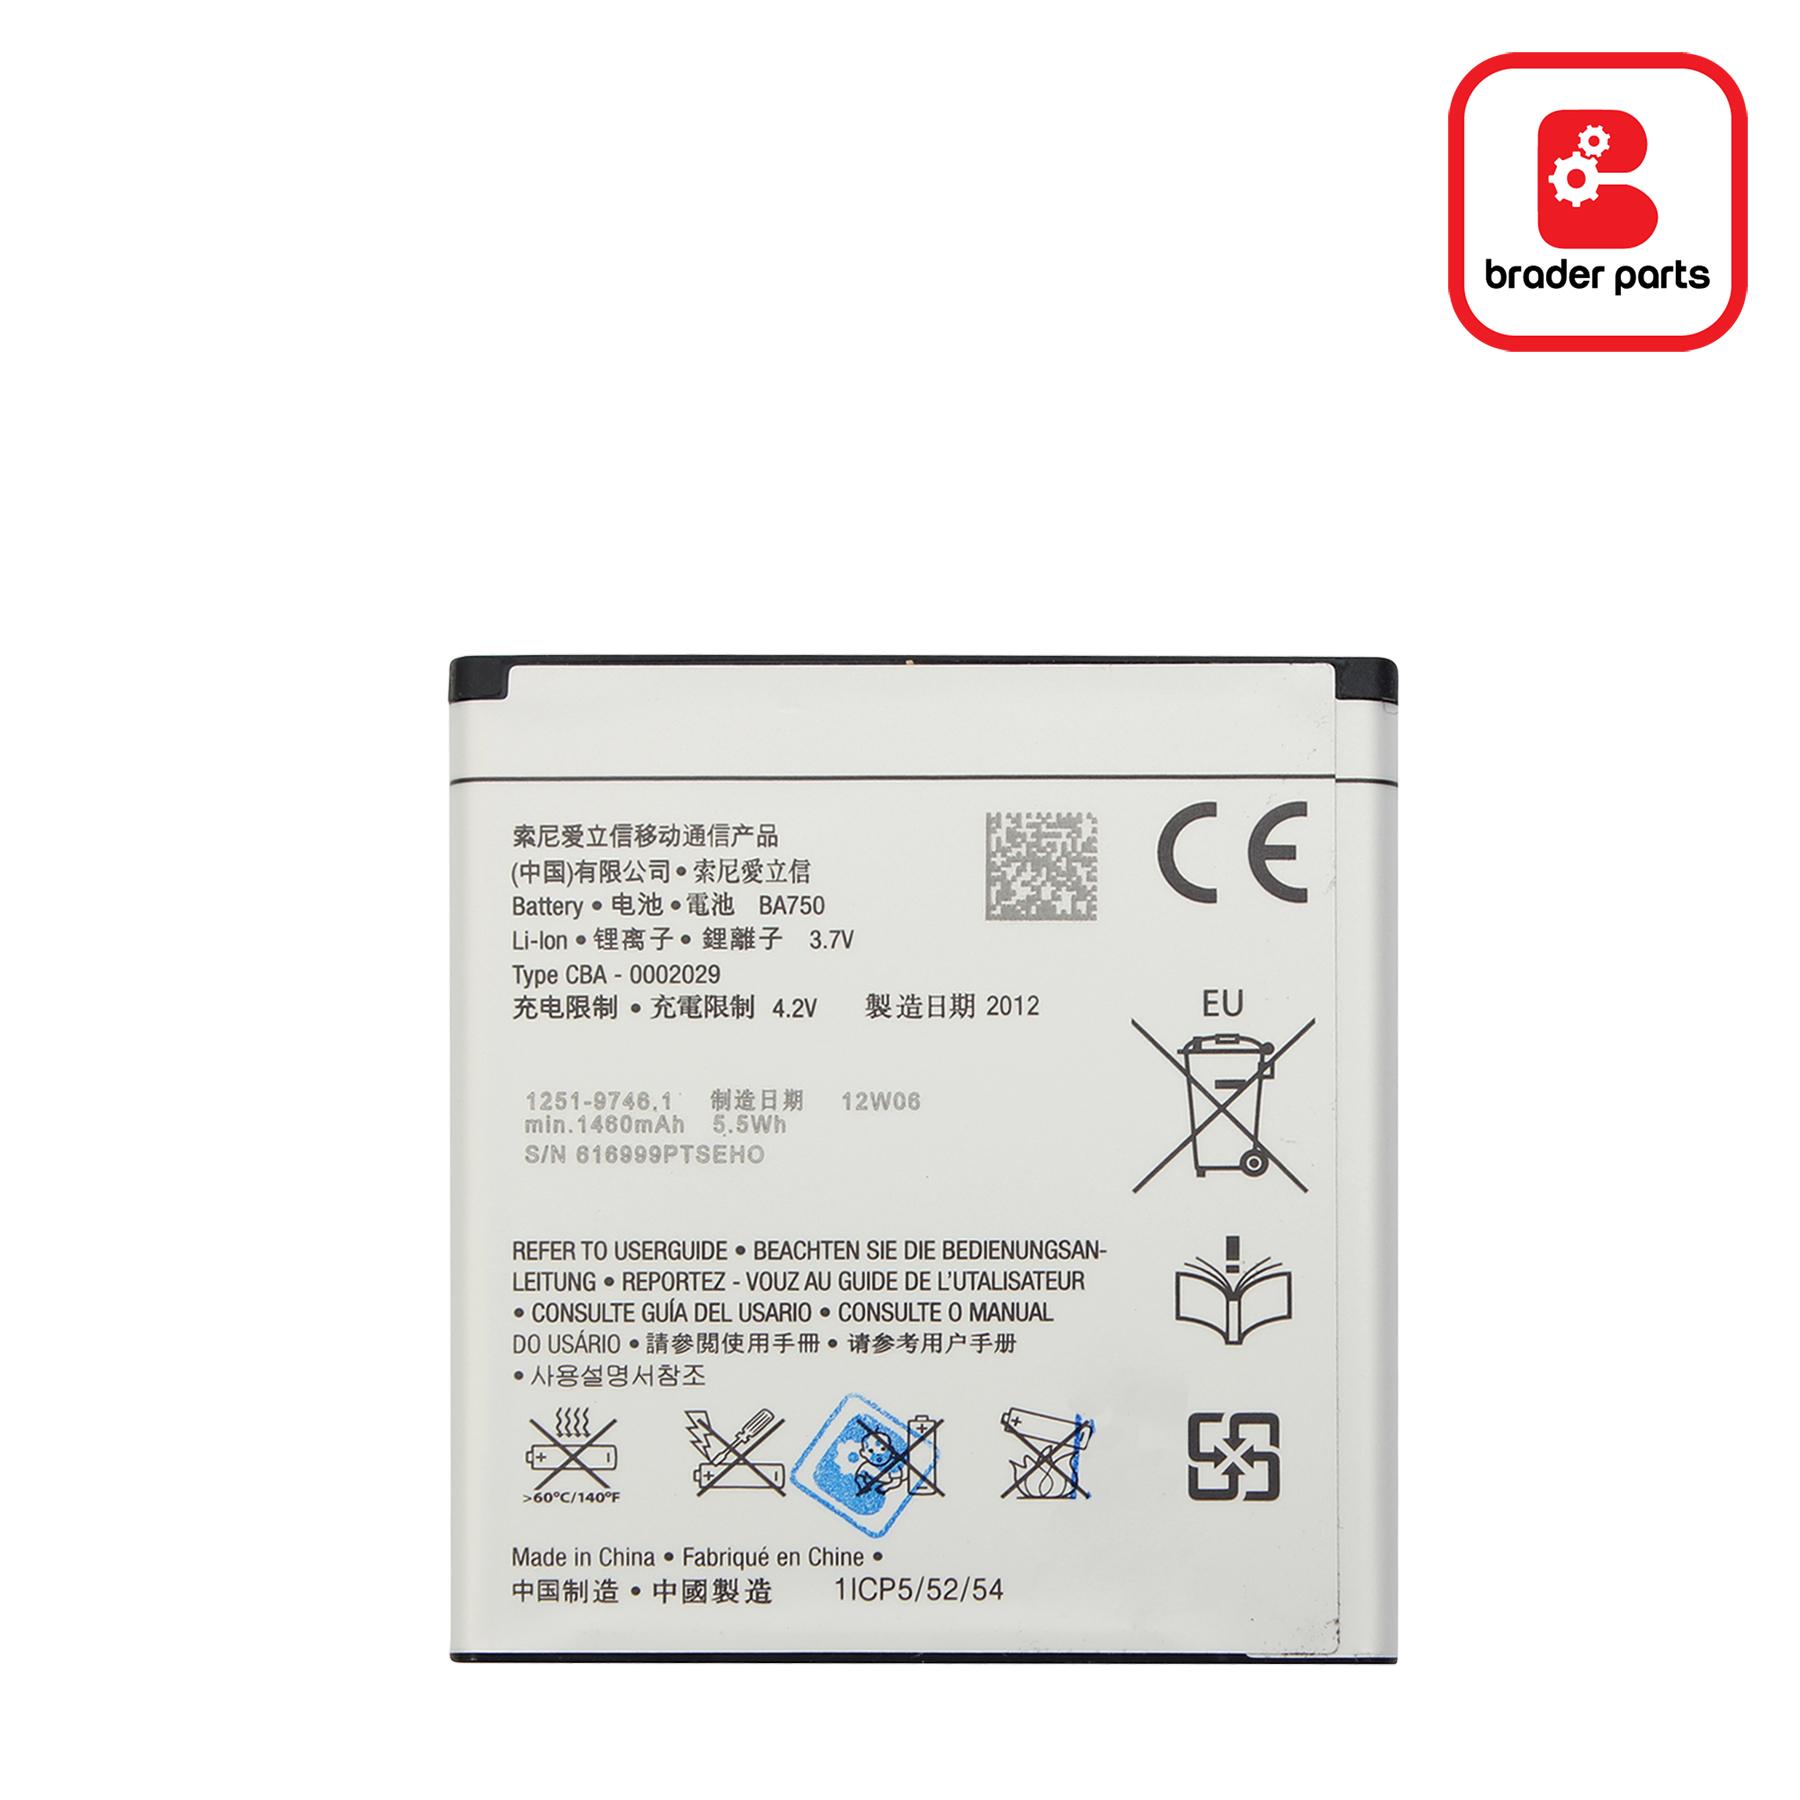 Baterai ARC /ARC S/LT15i/LT18/X12 BA750